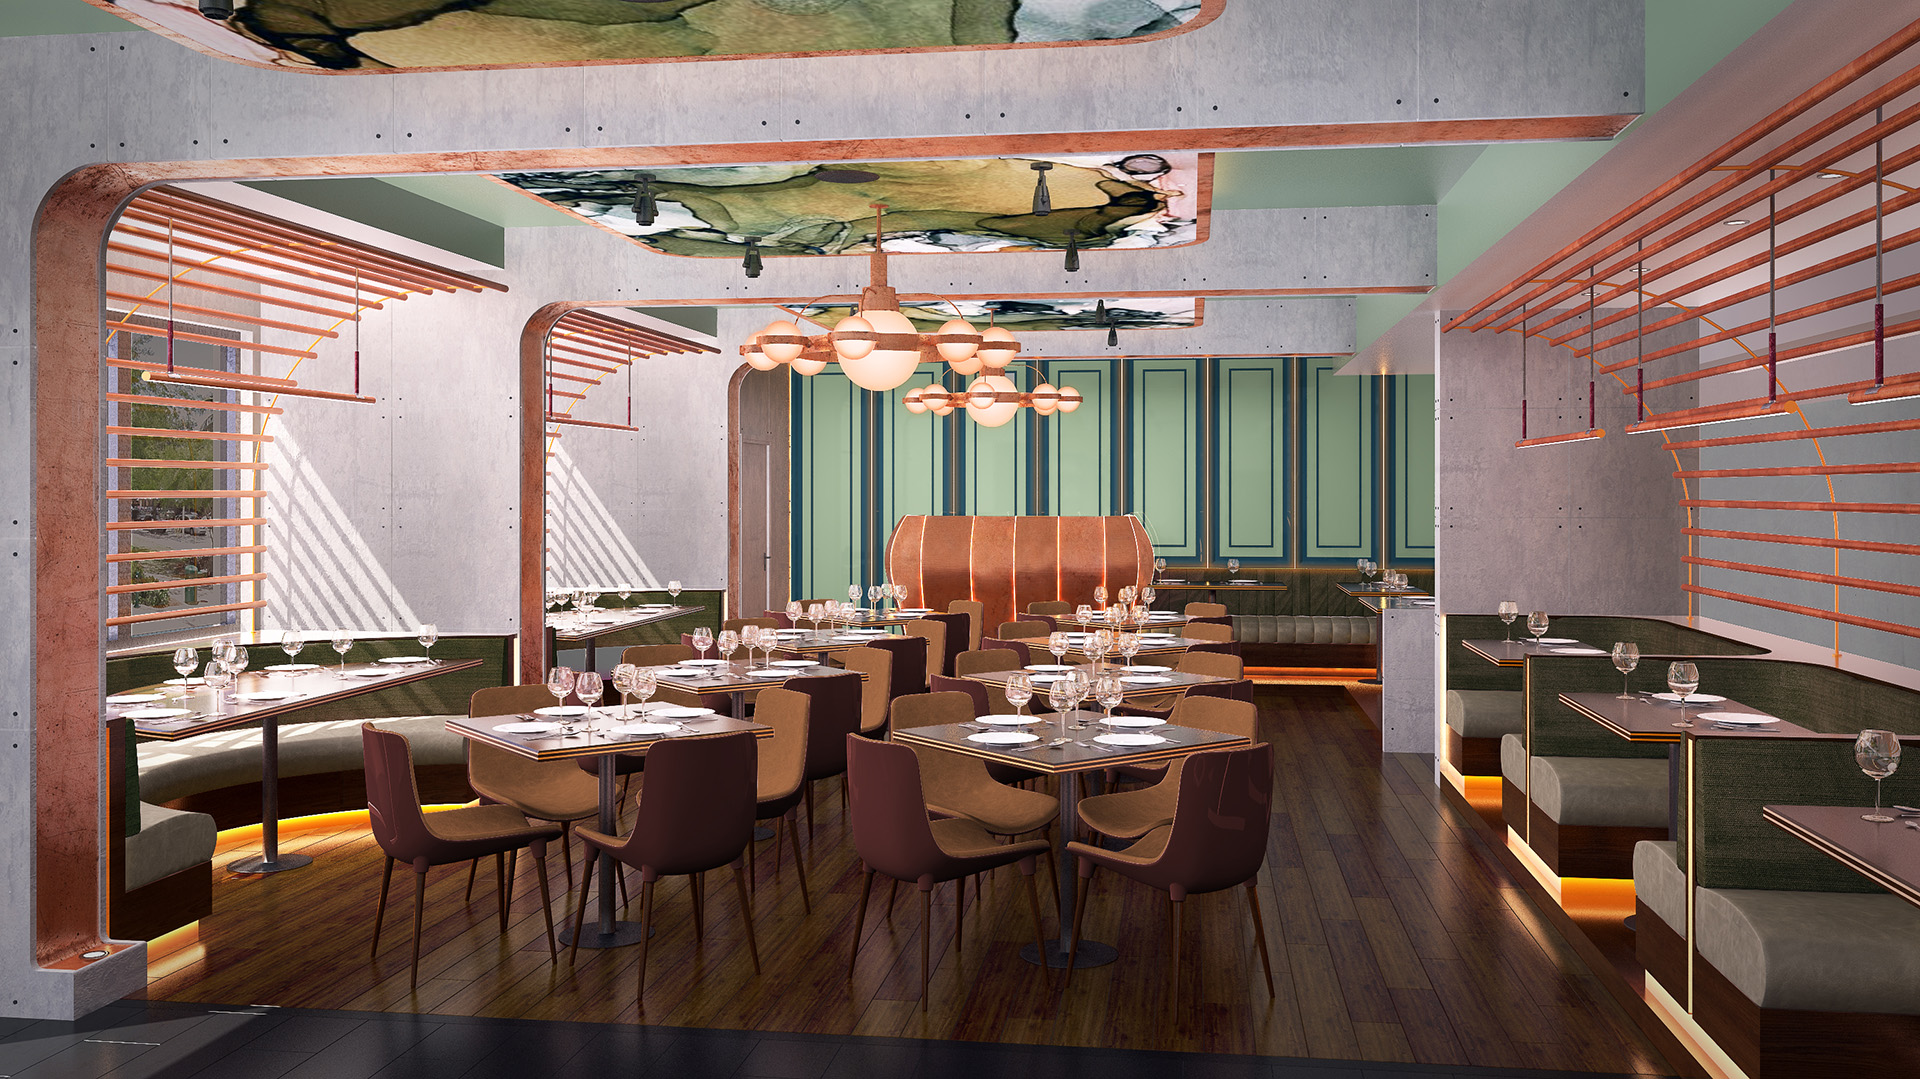 Restaurant Concept in Del Rey Beach